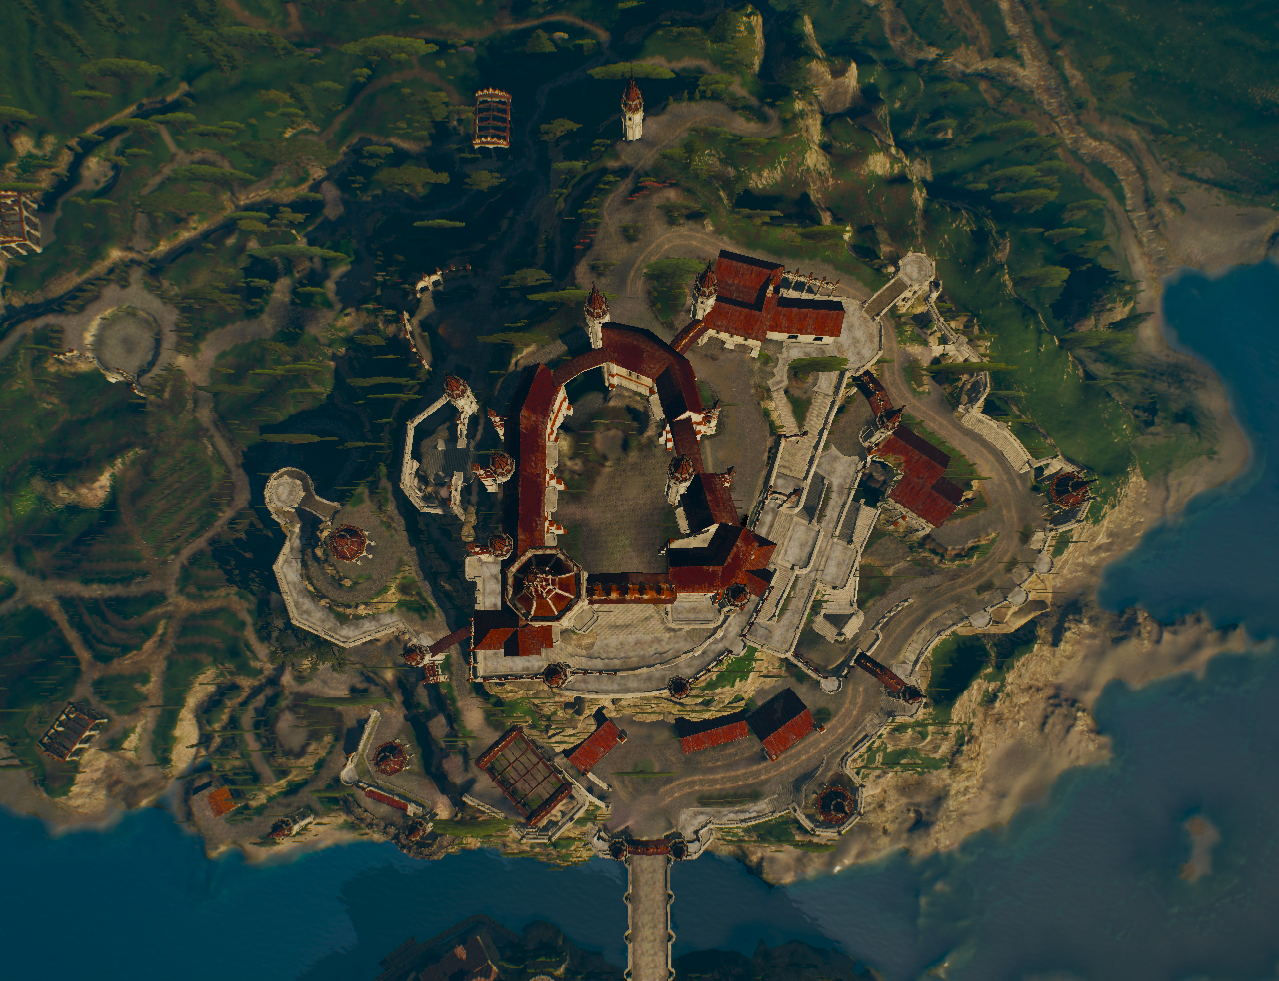 Baddeecaag castle inspiration